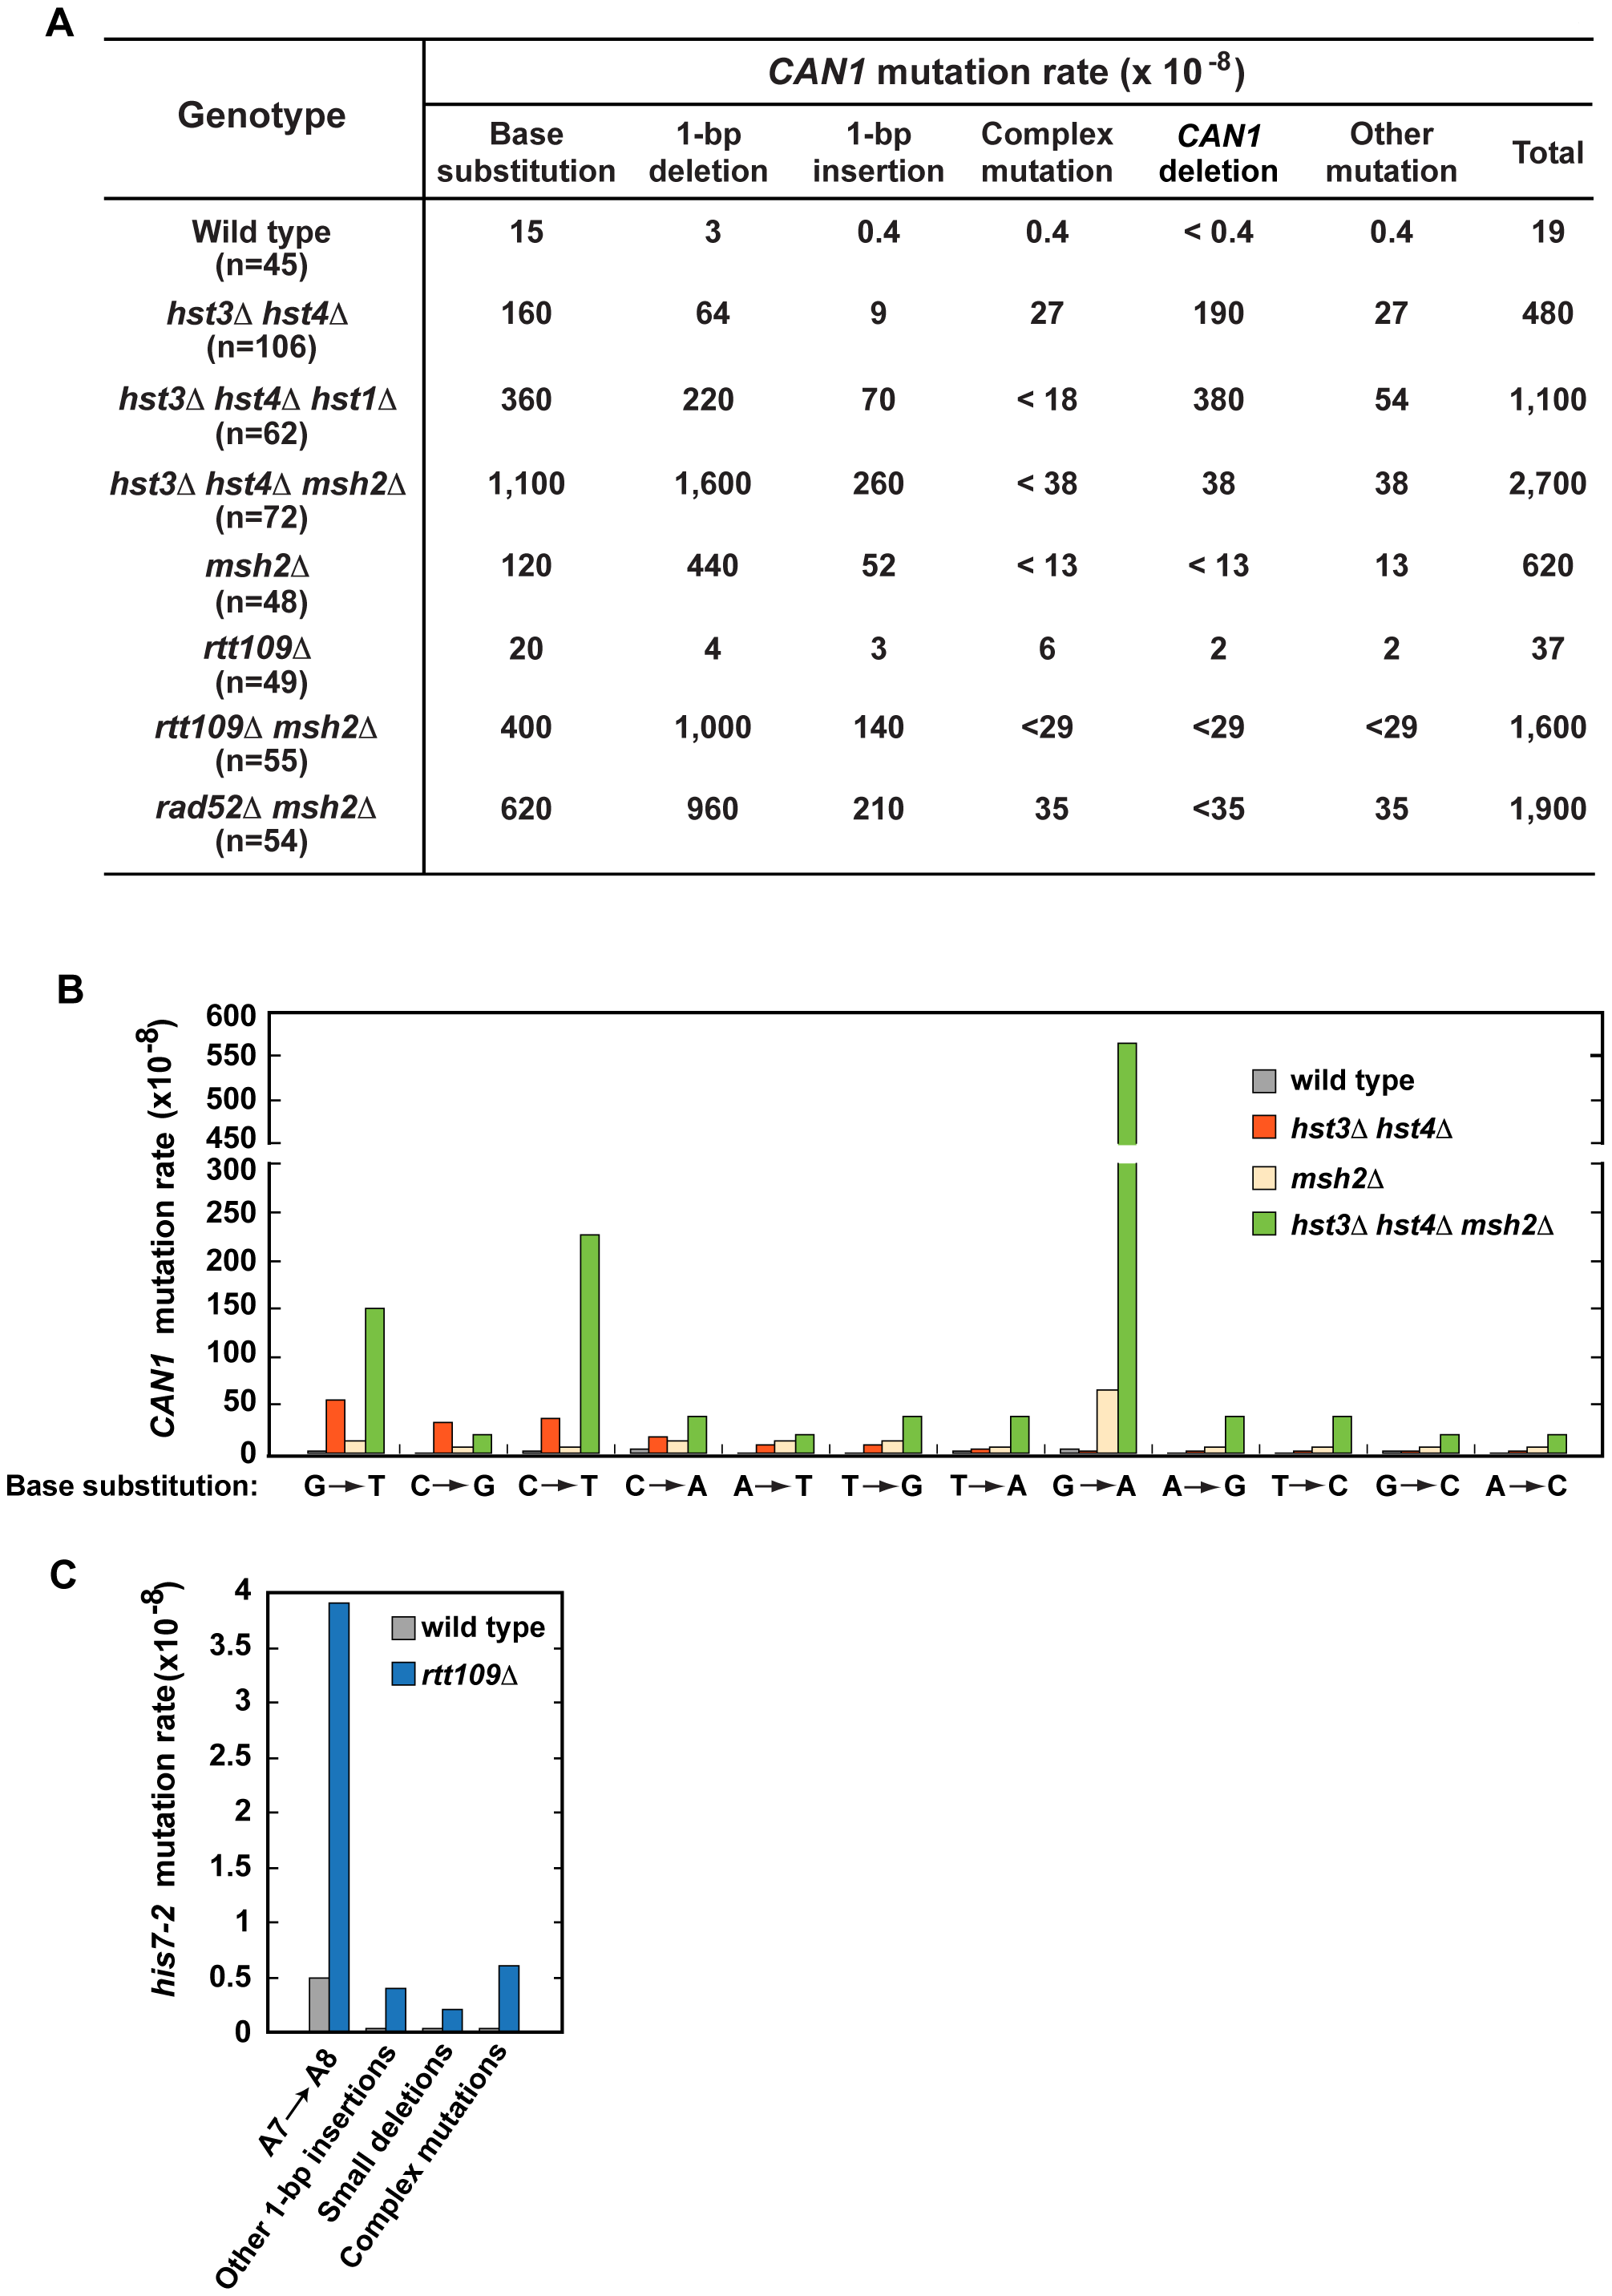 Characterization of spontaneous mutagenesis in <i>hst3</i>Δ <i>hst4</i>Δ and <i>rtt109</i>Δ strains.